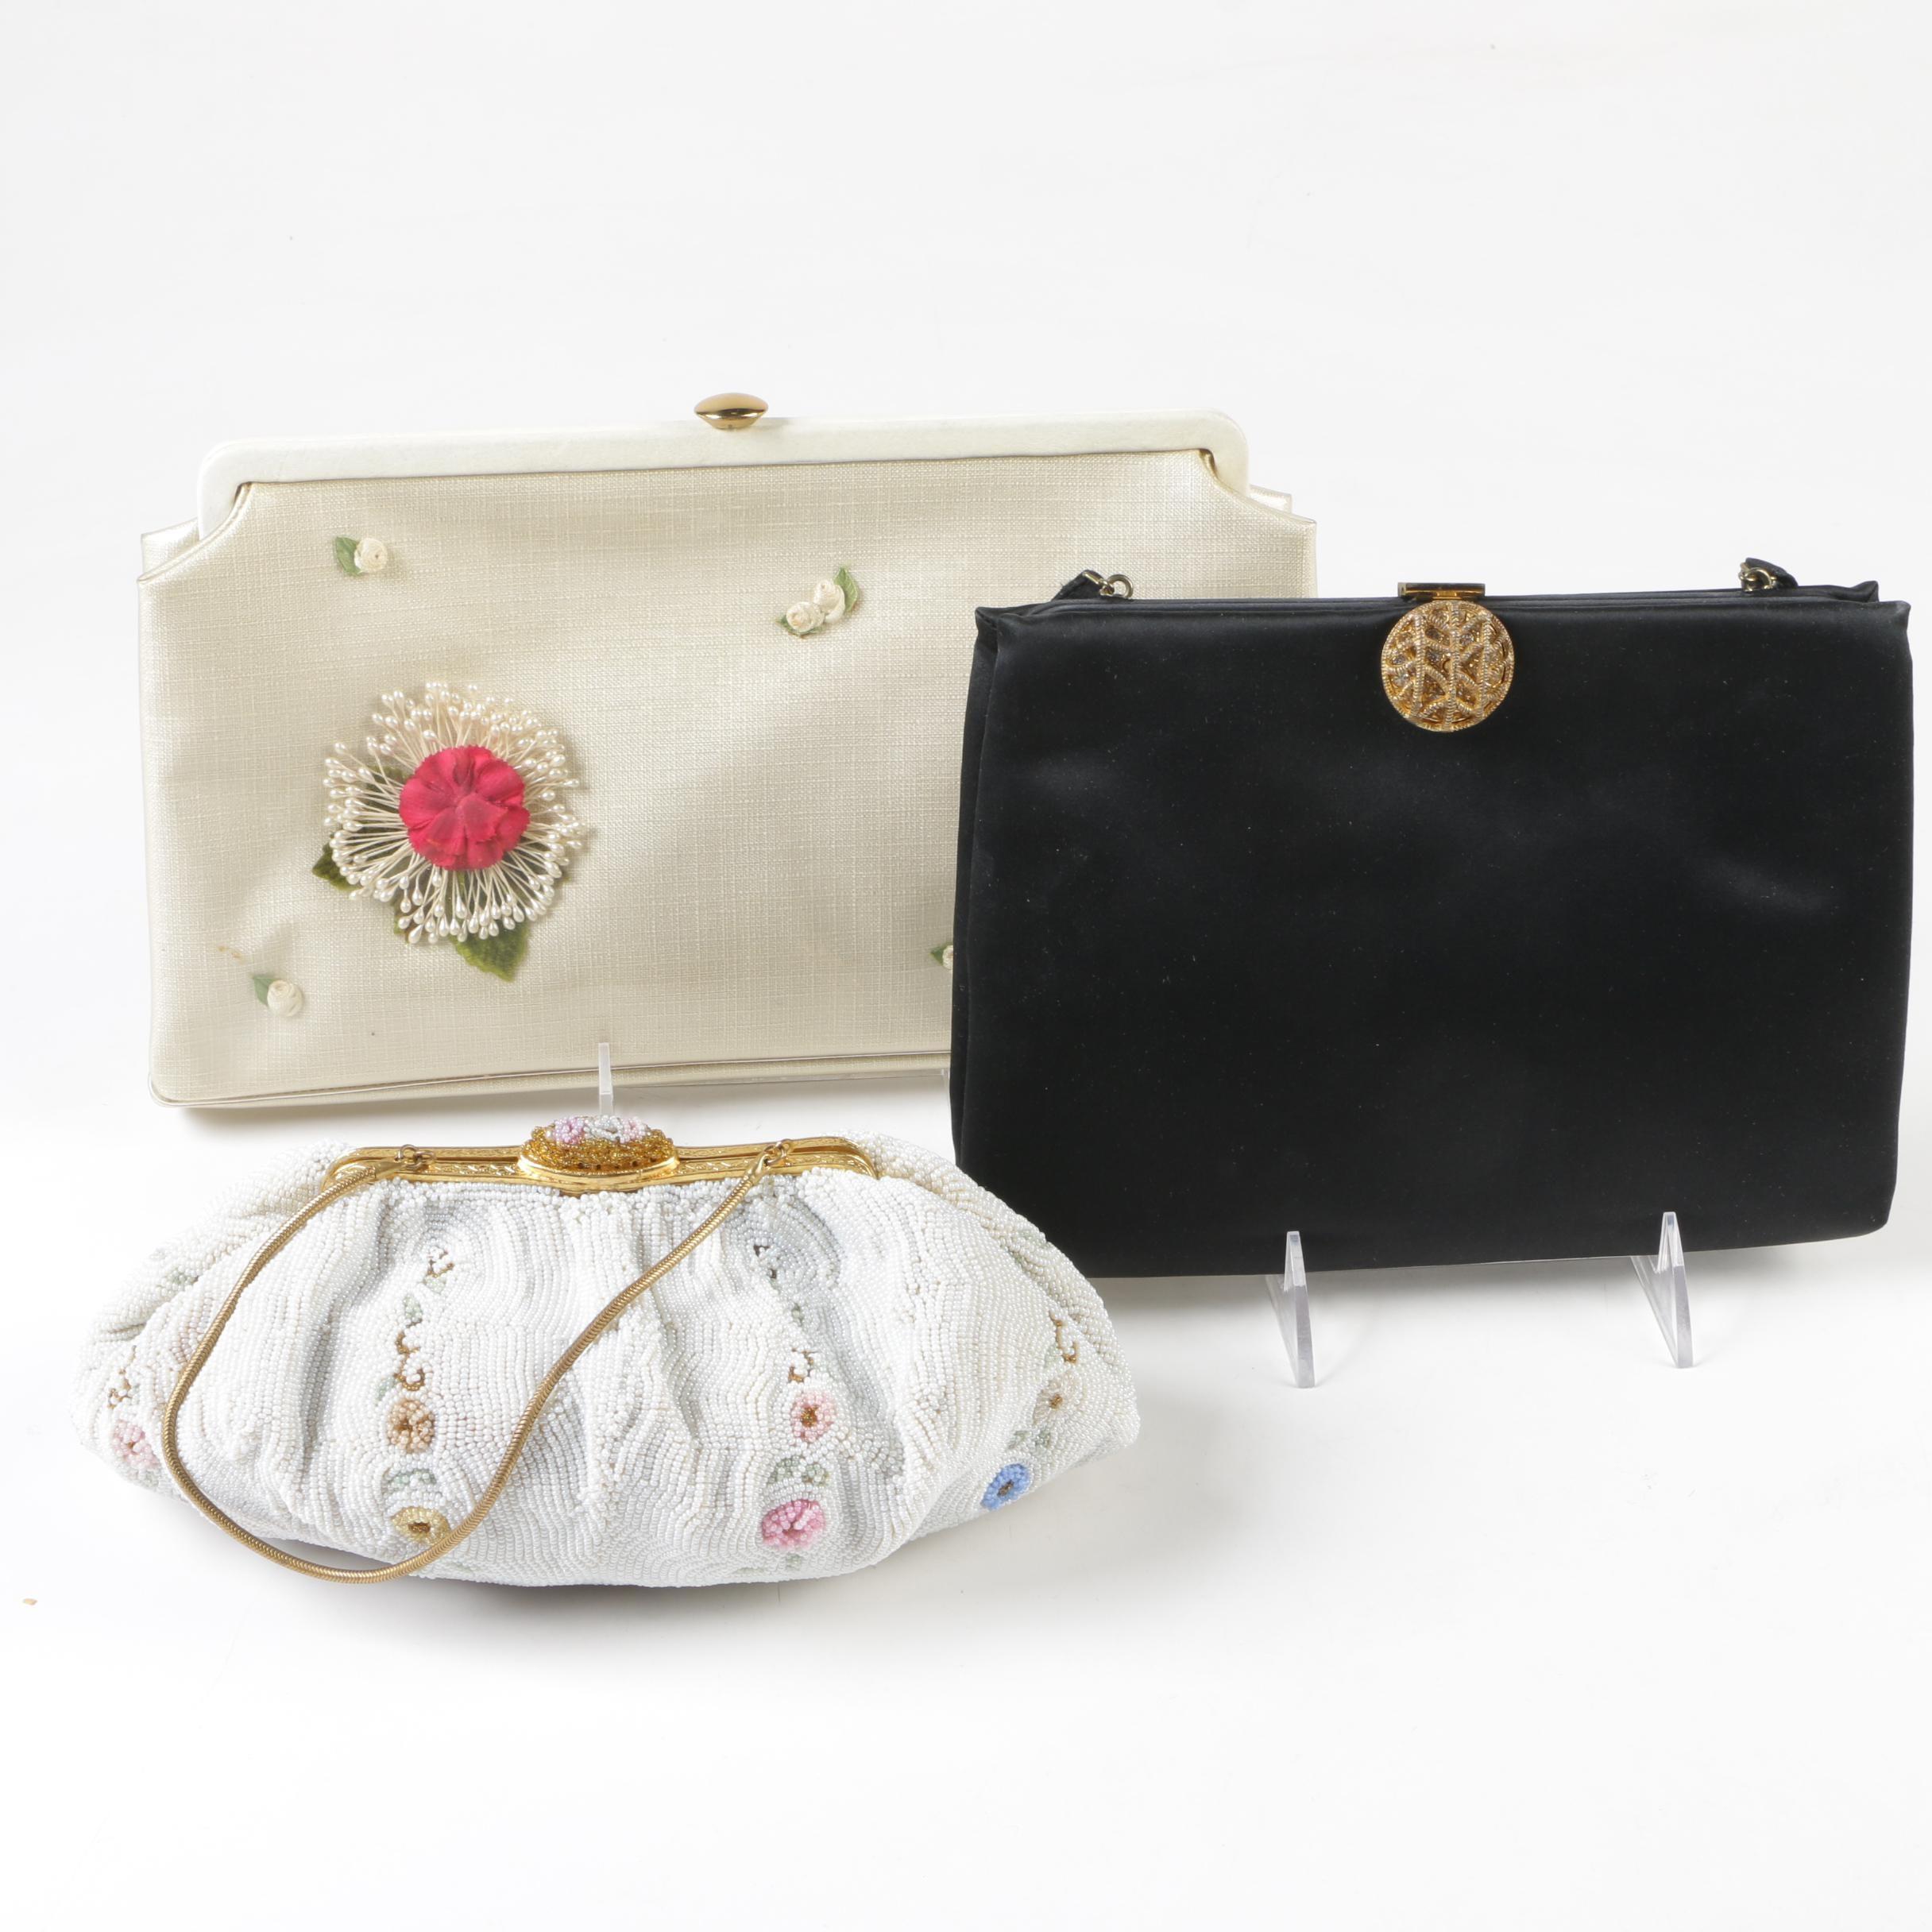 Rosenfeld Clutch, Black Silk Clutch, Coin Purses, and Beaded Handbag